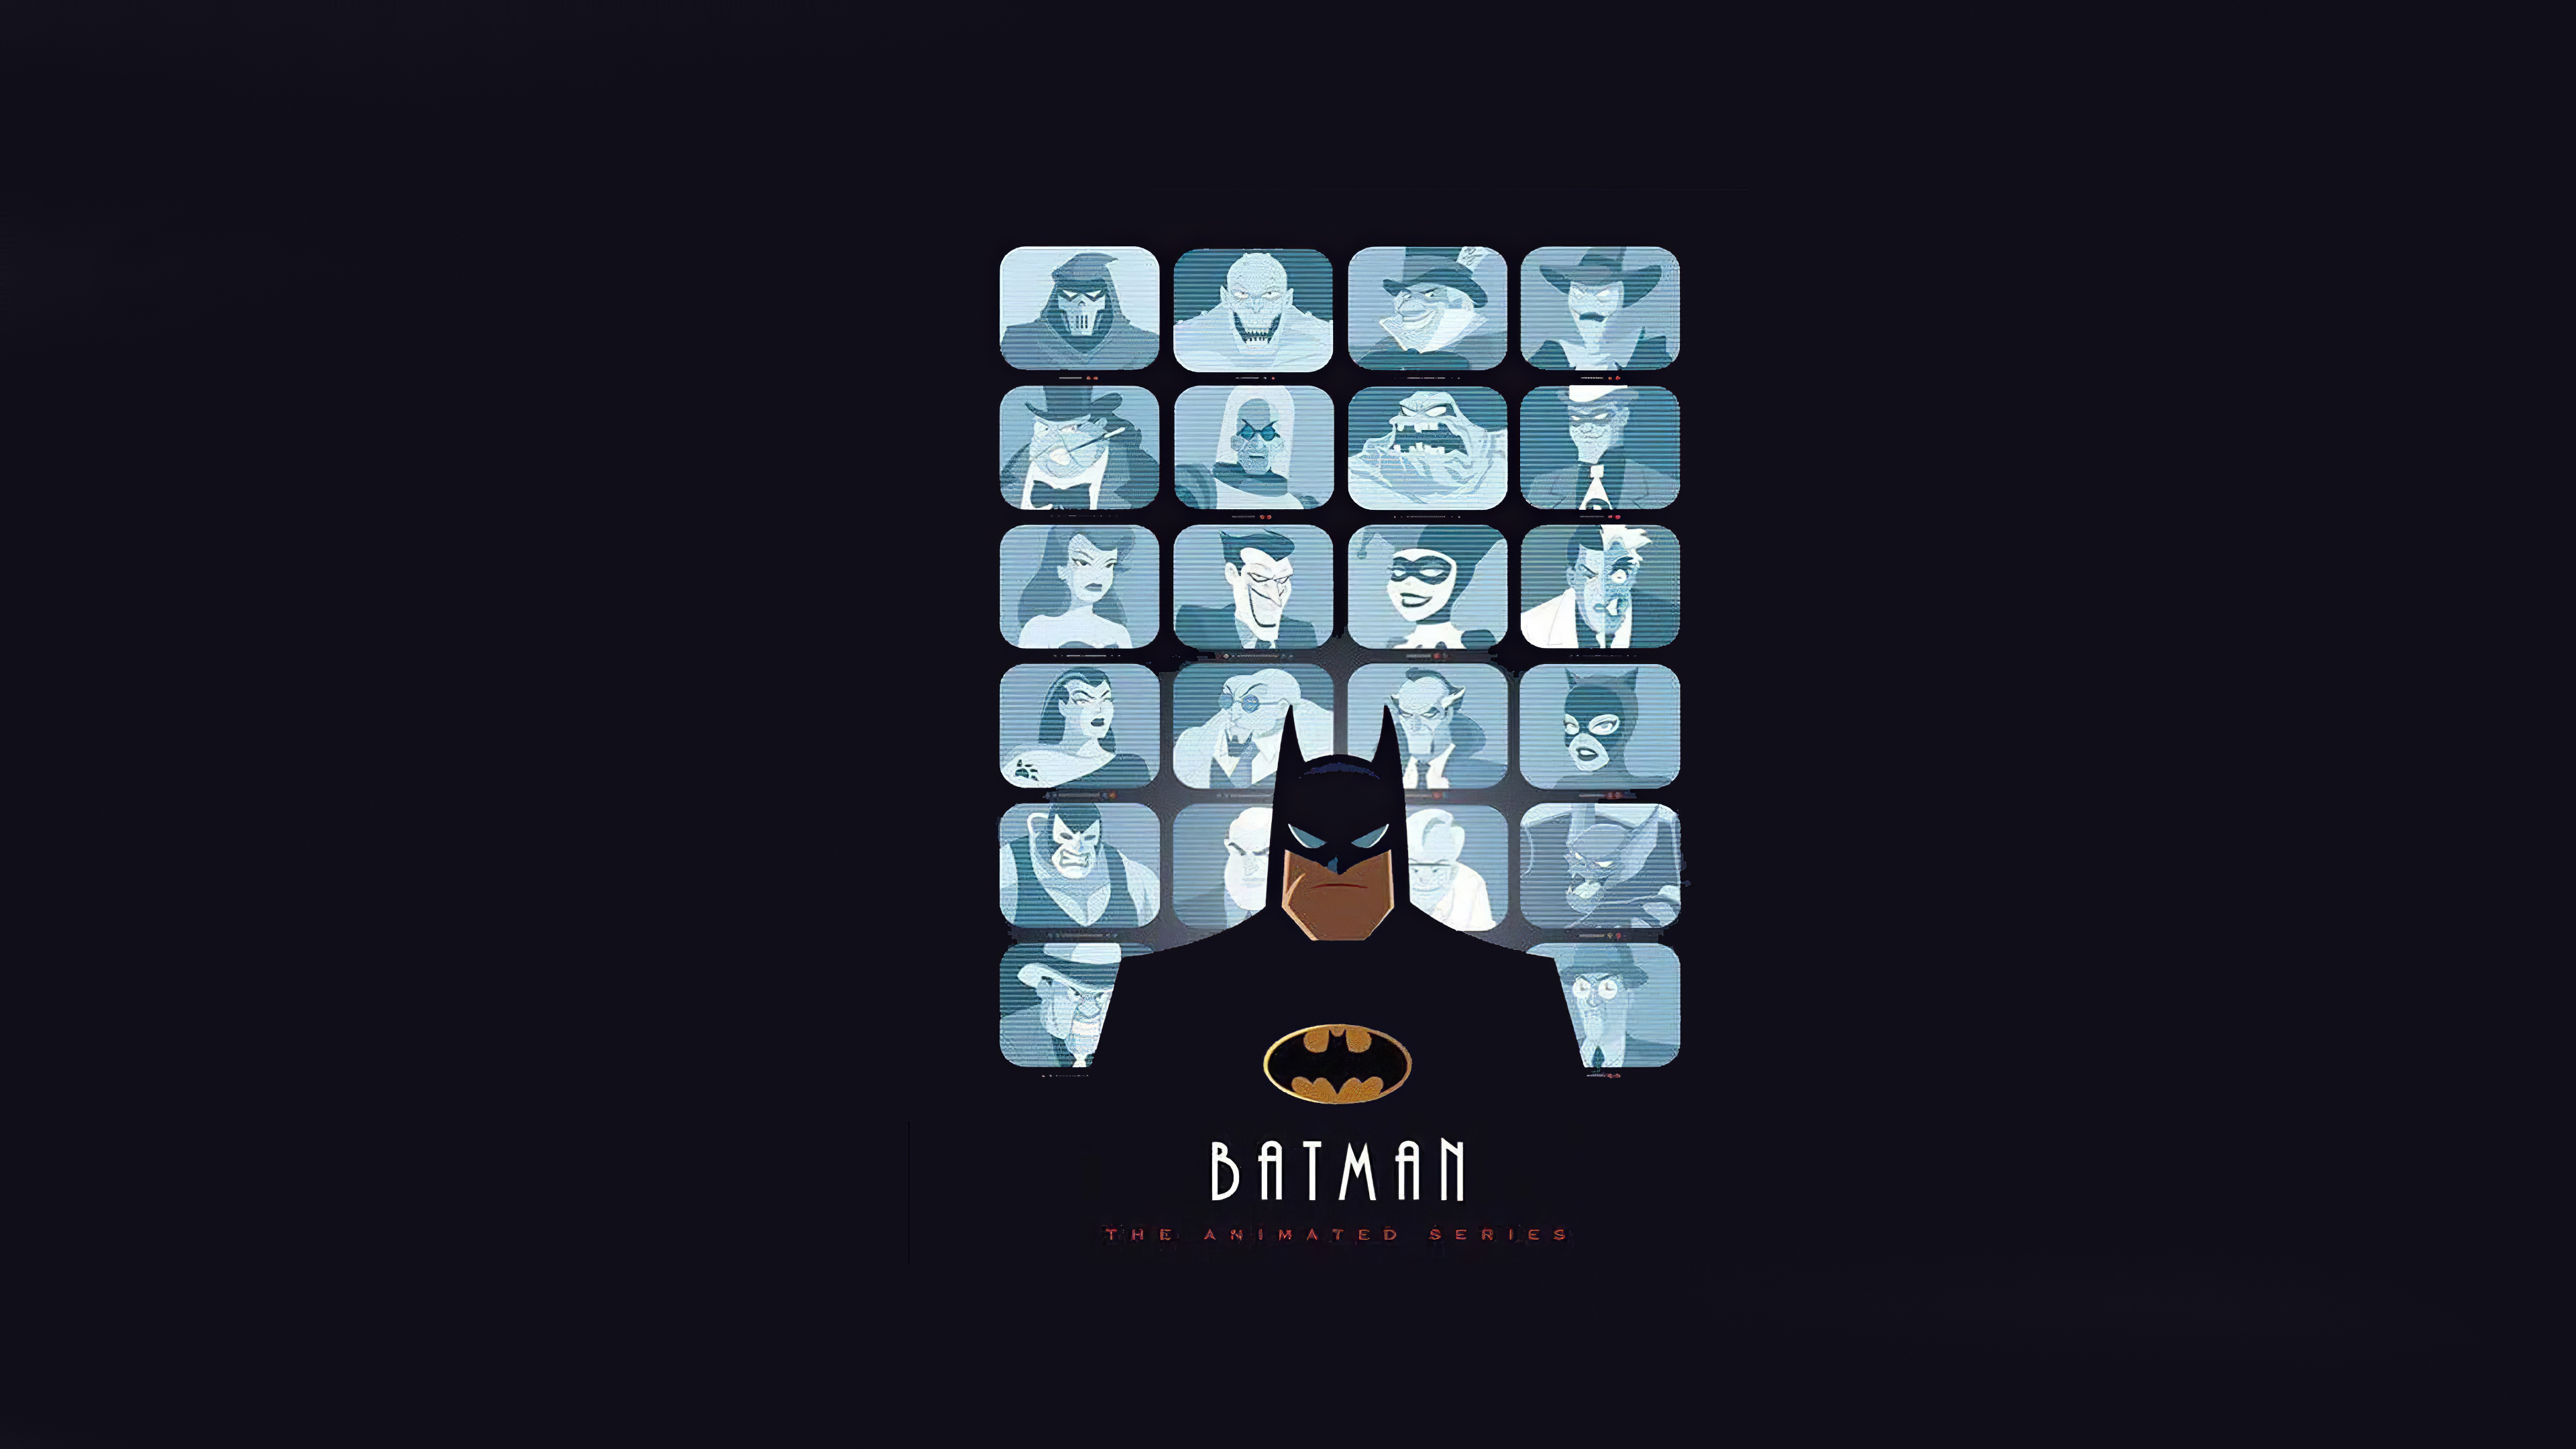 batman the animated tv series 1580588363 - Batman The Animated Tv Series - Batman The Animated Tv Series wallpapers 4k